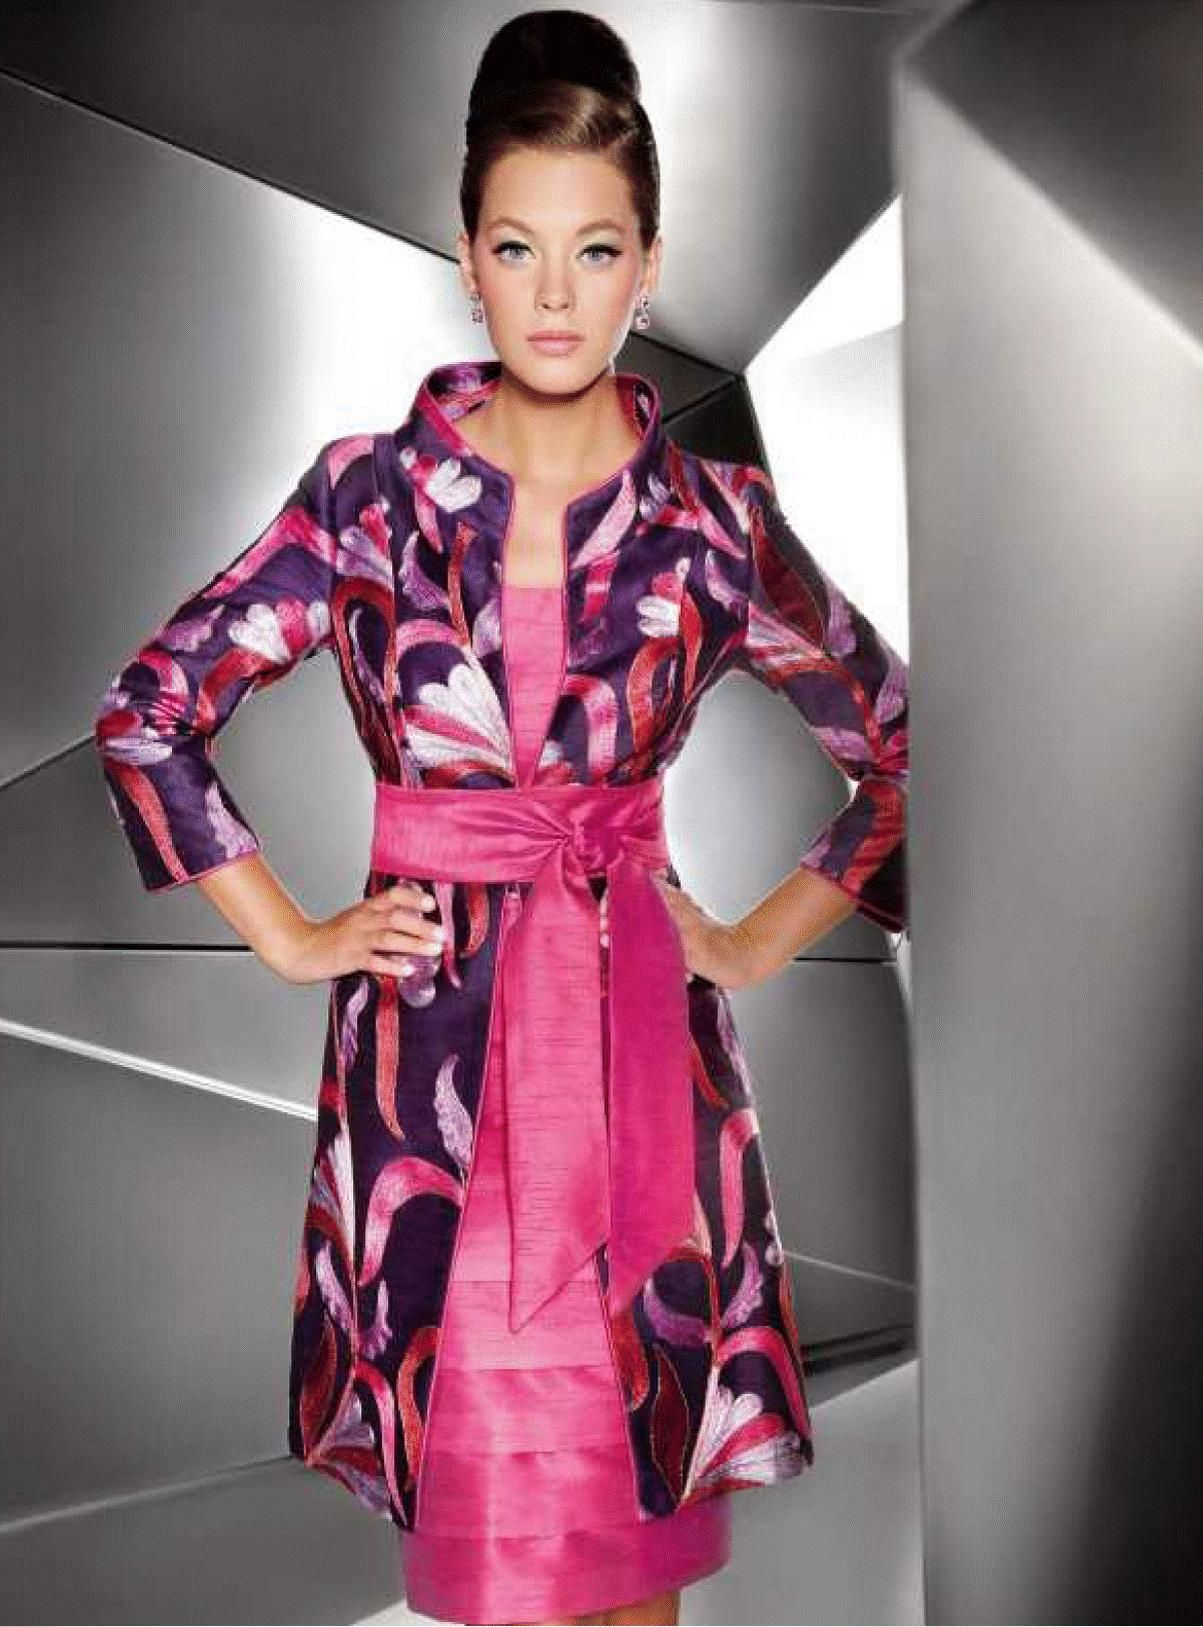 Design by Sonia Peña | That\'s so fashionable! | Pinterest | Bodas ...